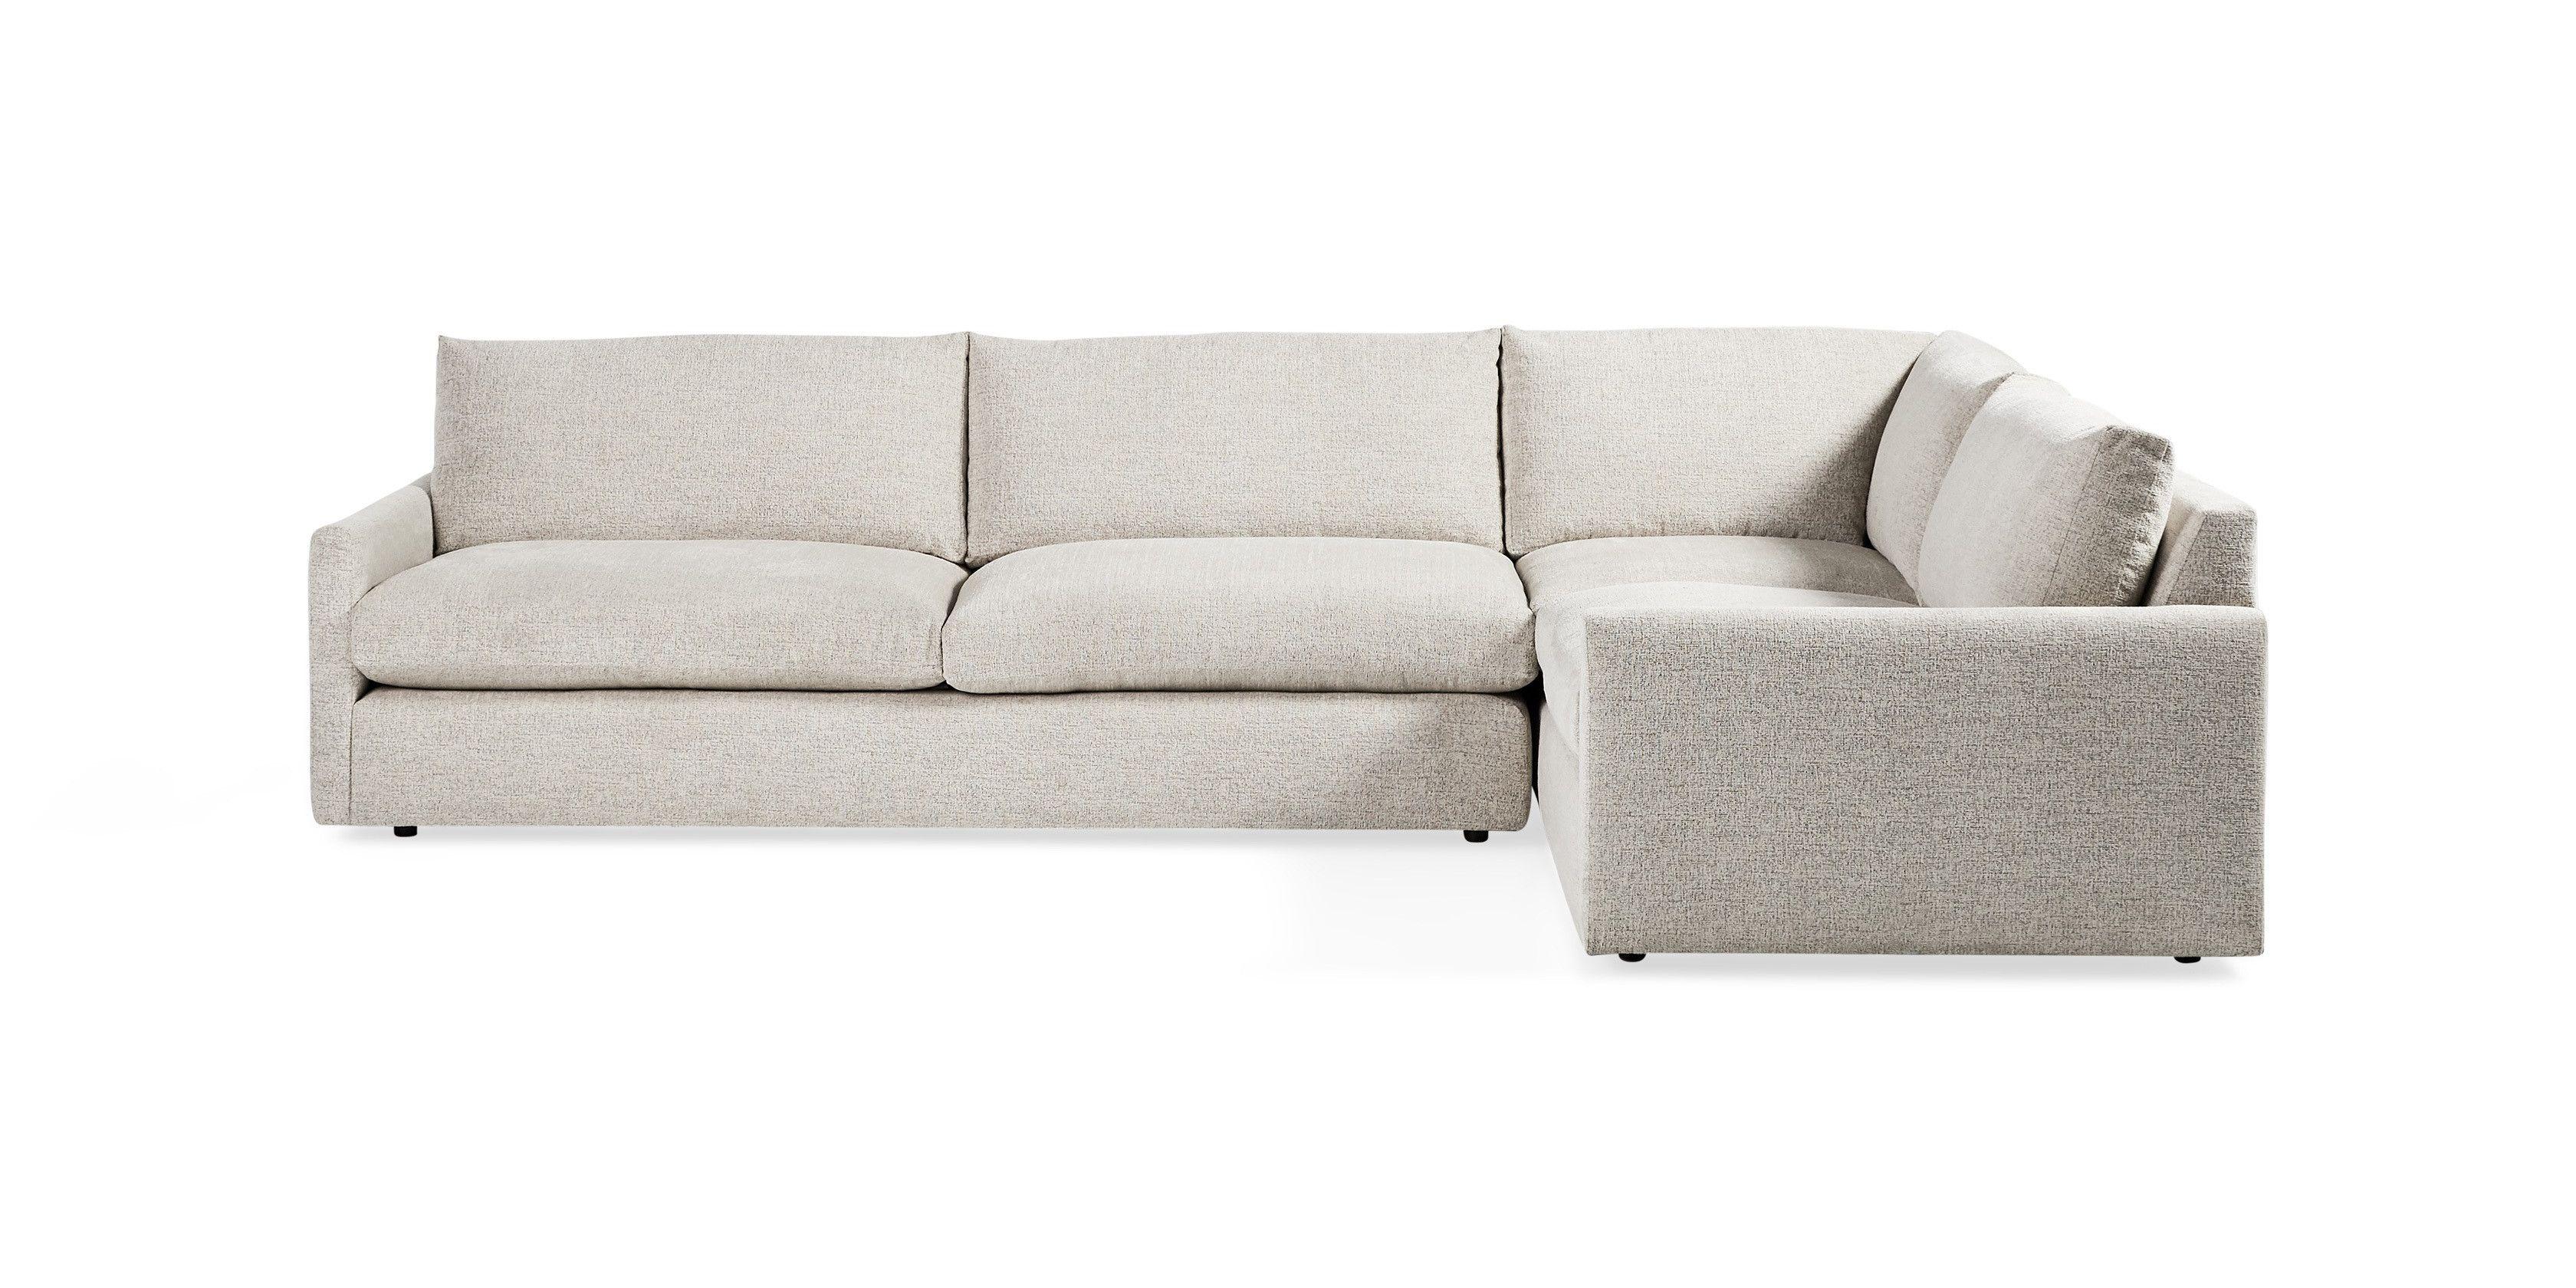 Magnificent Kipton Two Piece Sectional Arhaus Furniture In 2019 Customarchery Wood Chair Design Ideas Customarcherynet